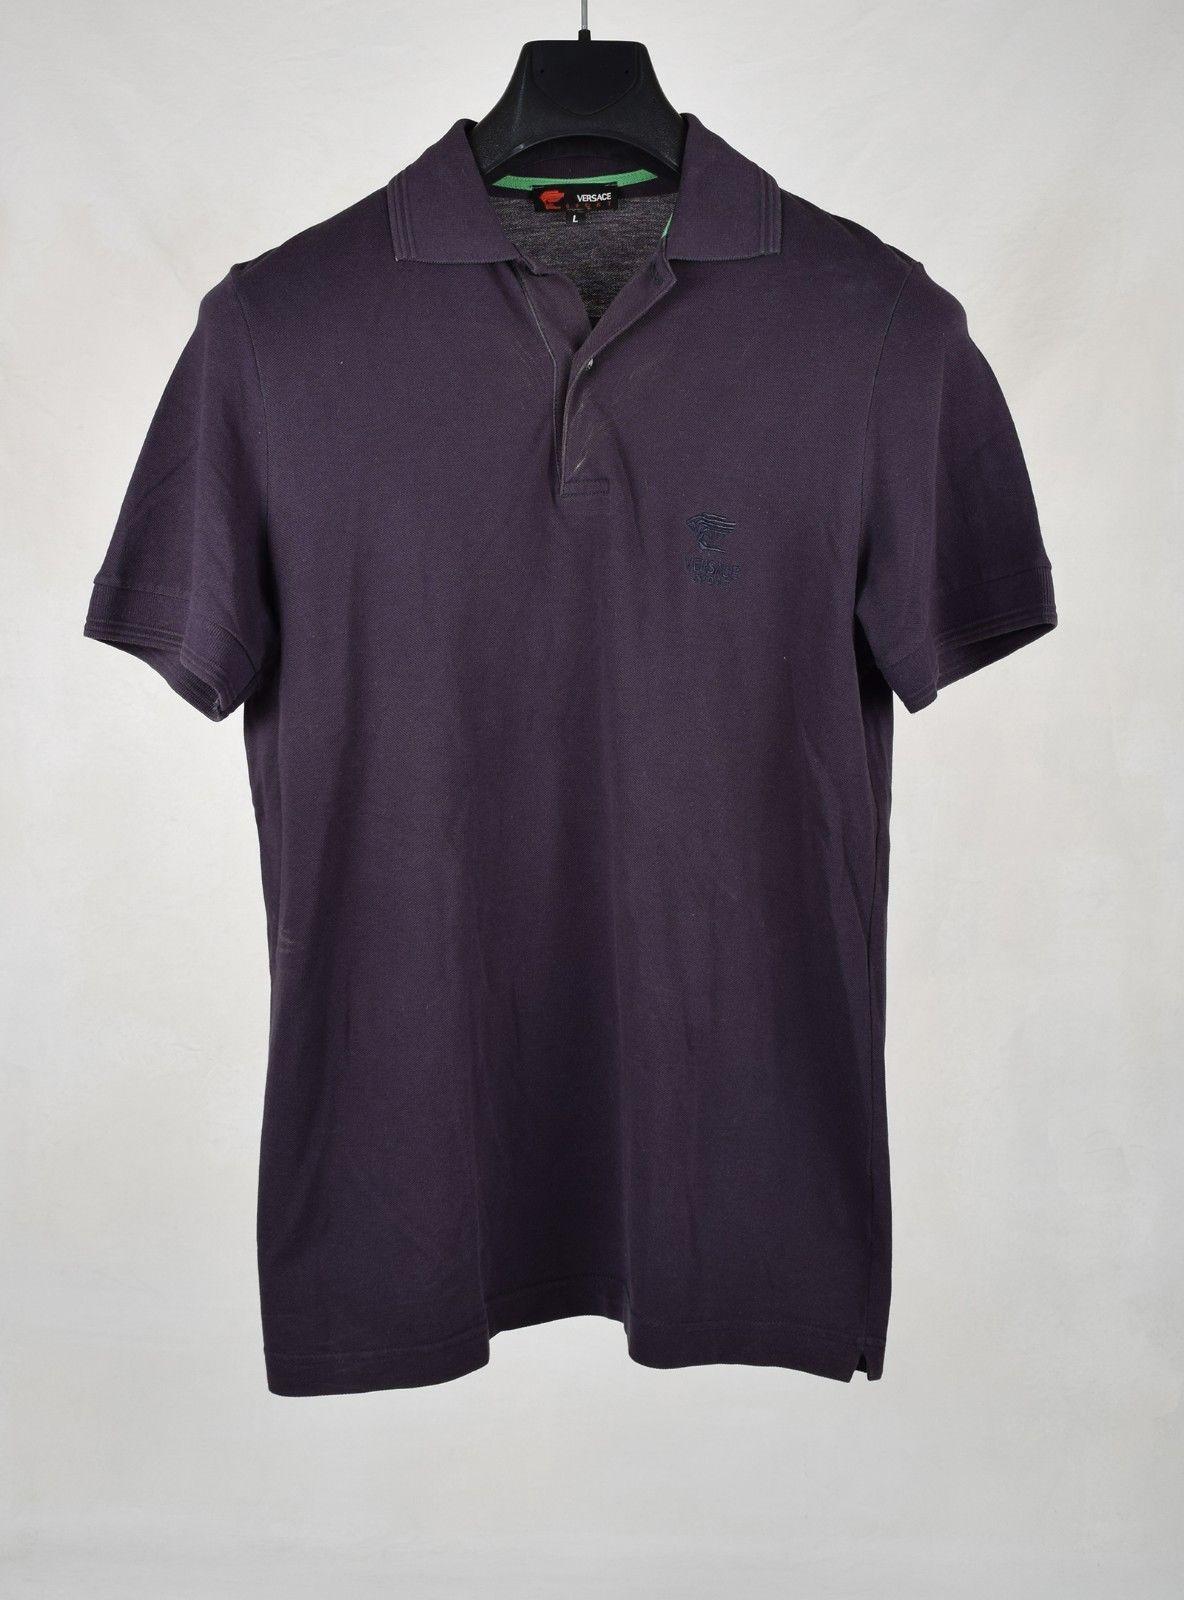 25.00 Versace Sport Mens Polo Shirt Short Sleeve Navy